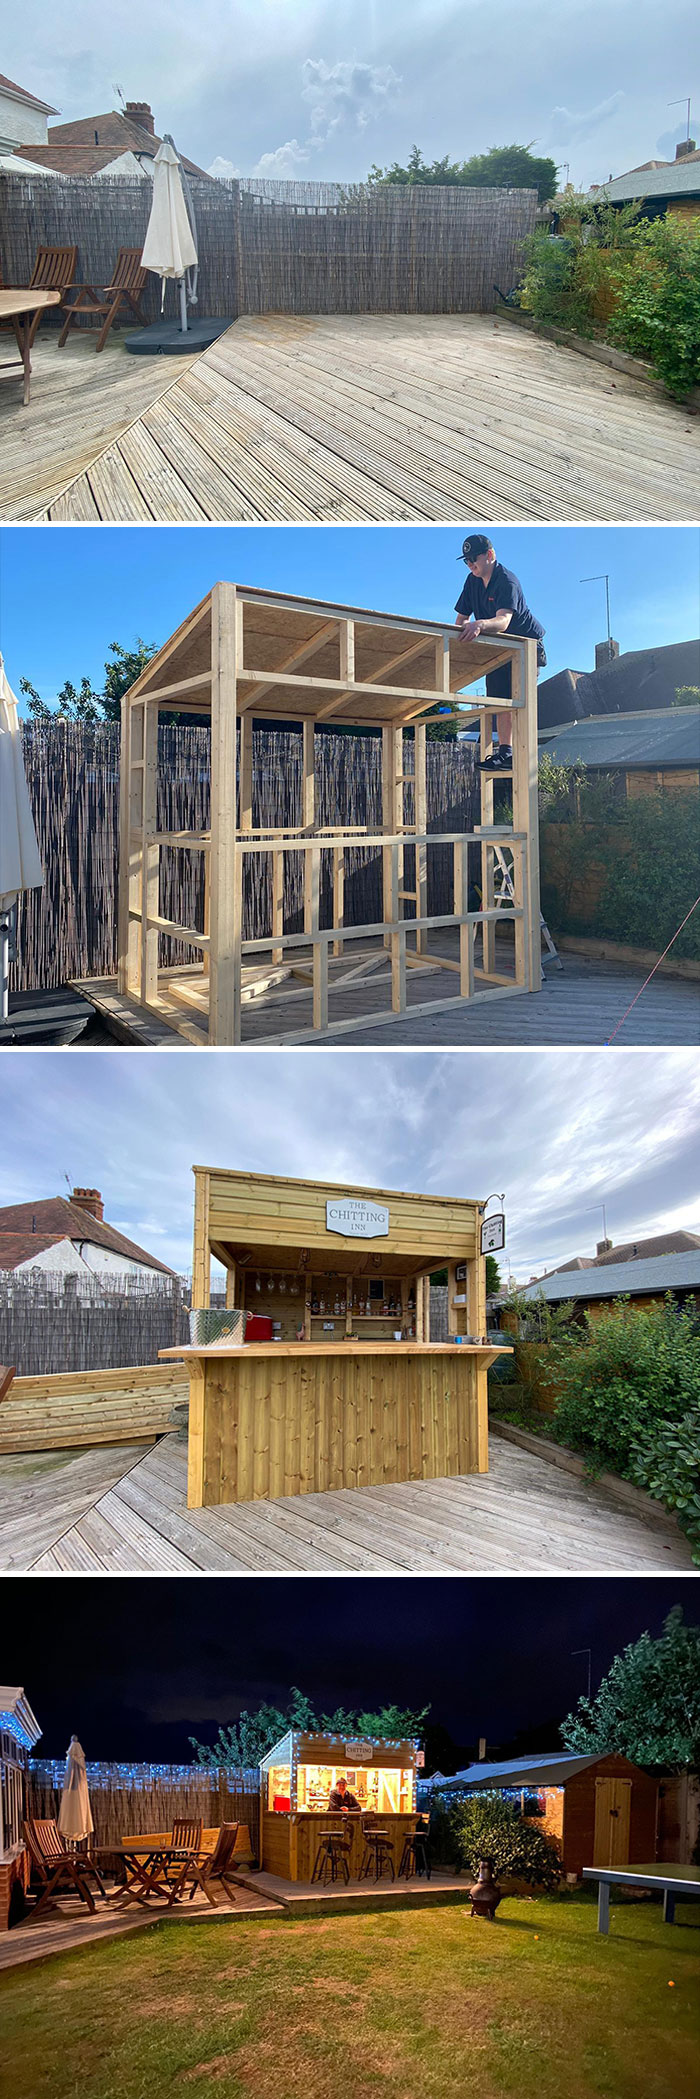 2020 Lockdown Garden Bar Build